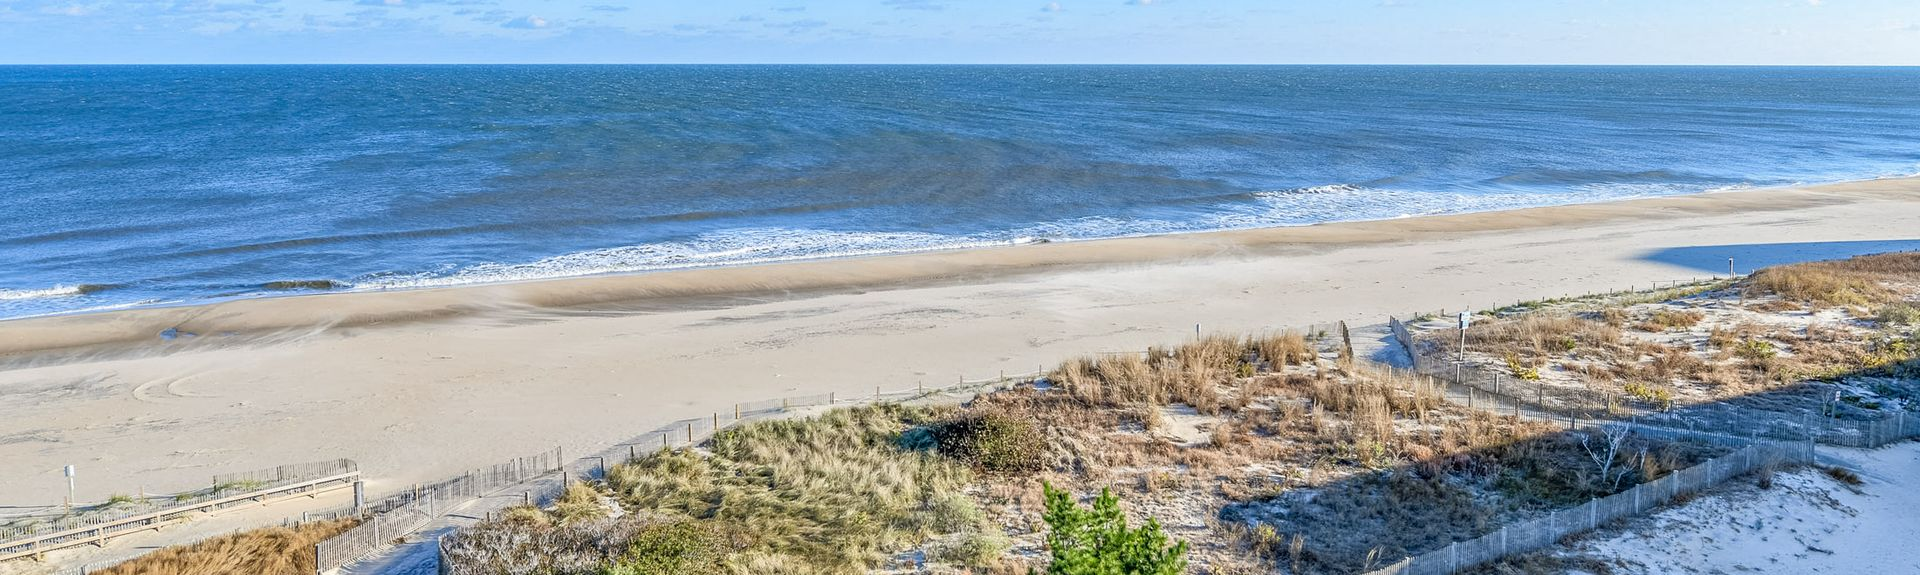 Sea Terrace, Ocean City, MD, USA